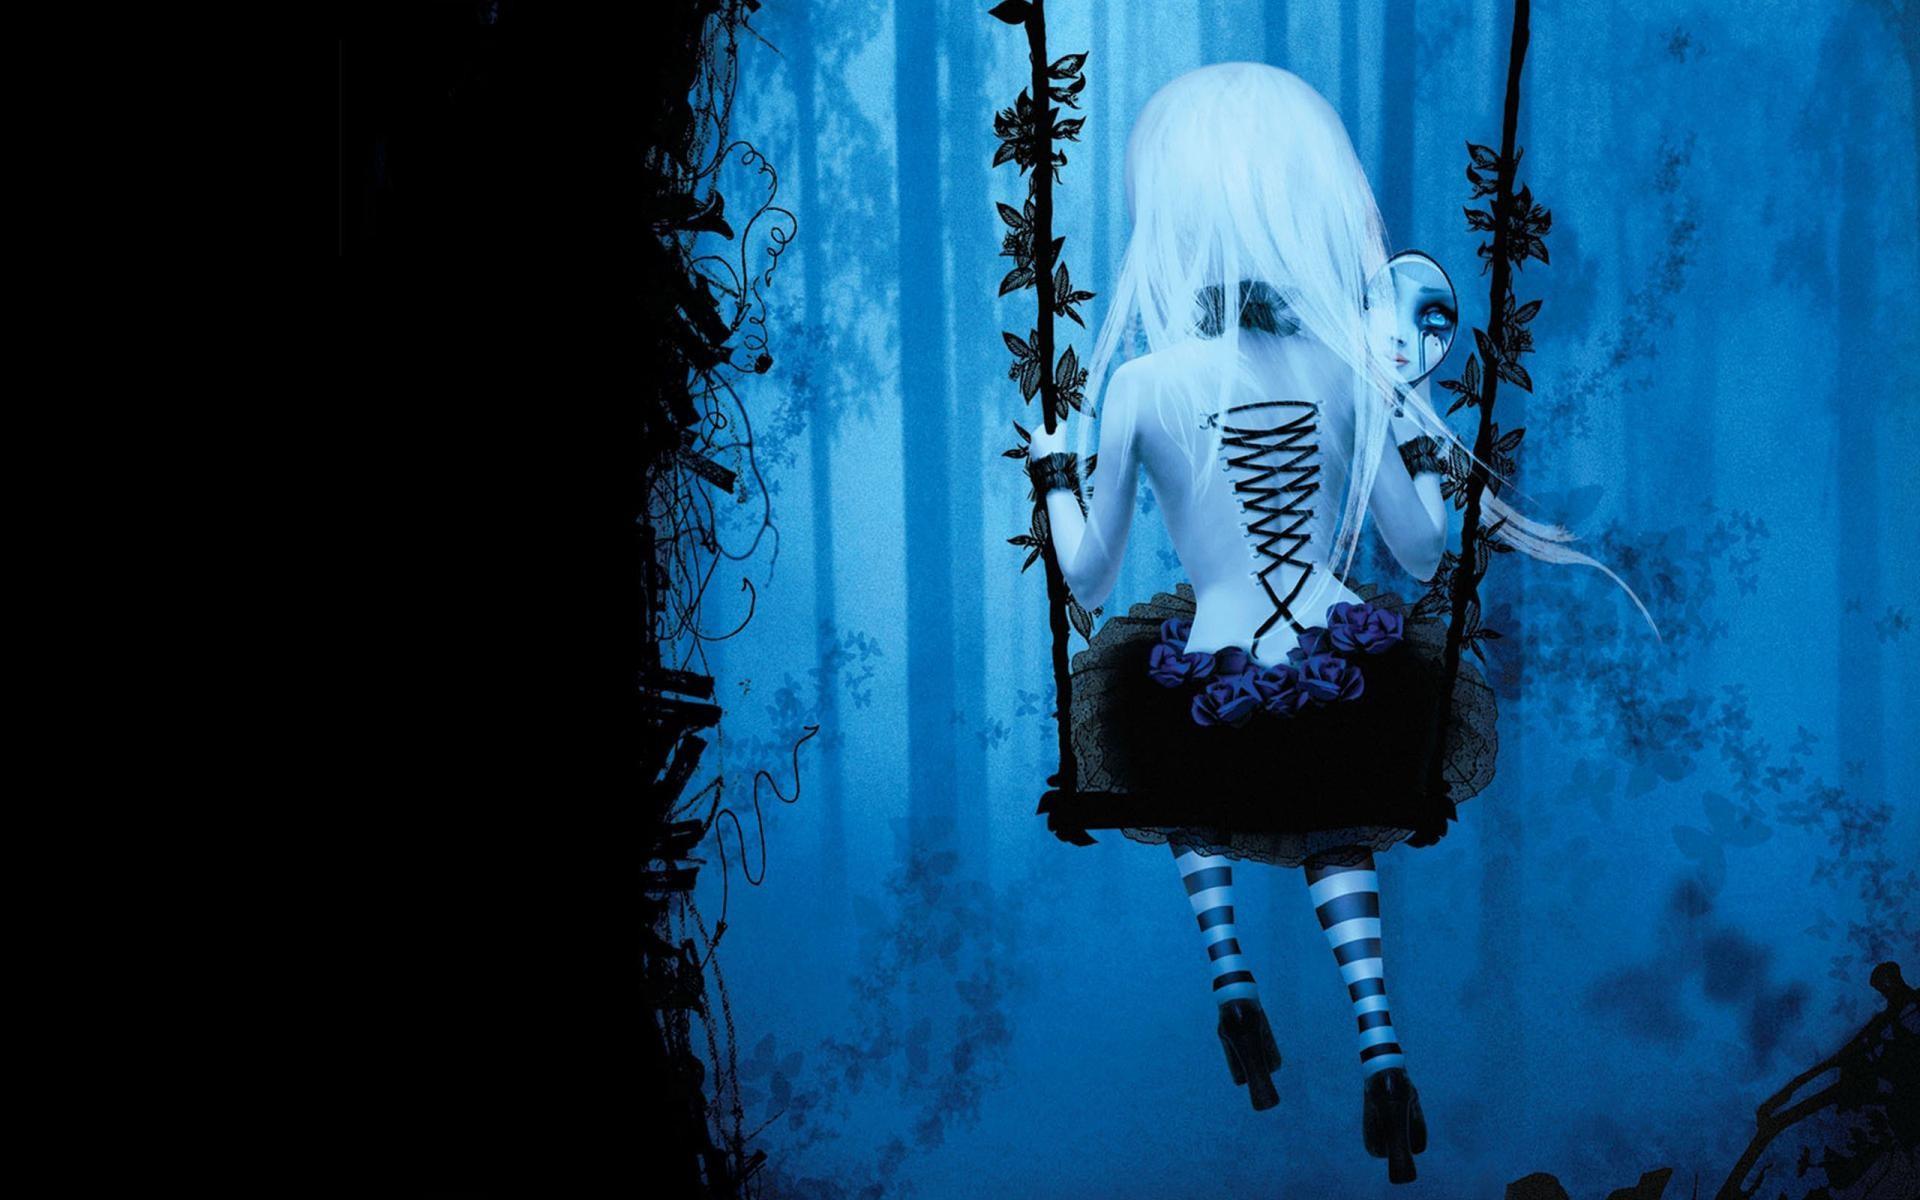 Anime 1920x1200 anime anime girls swings back stockings gothic lolita dark